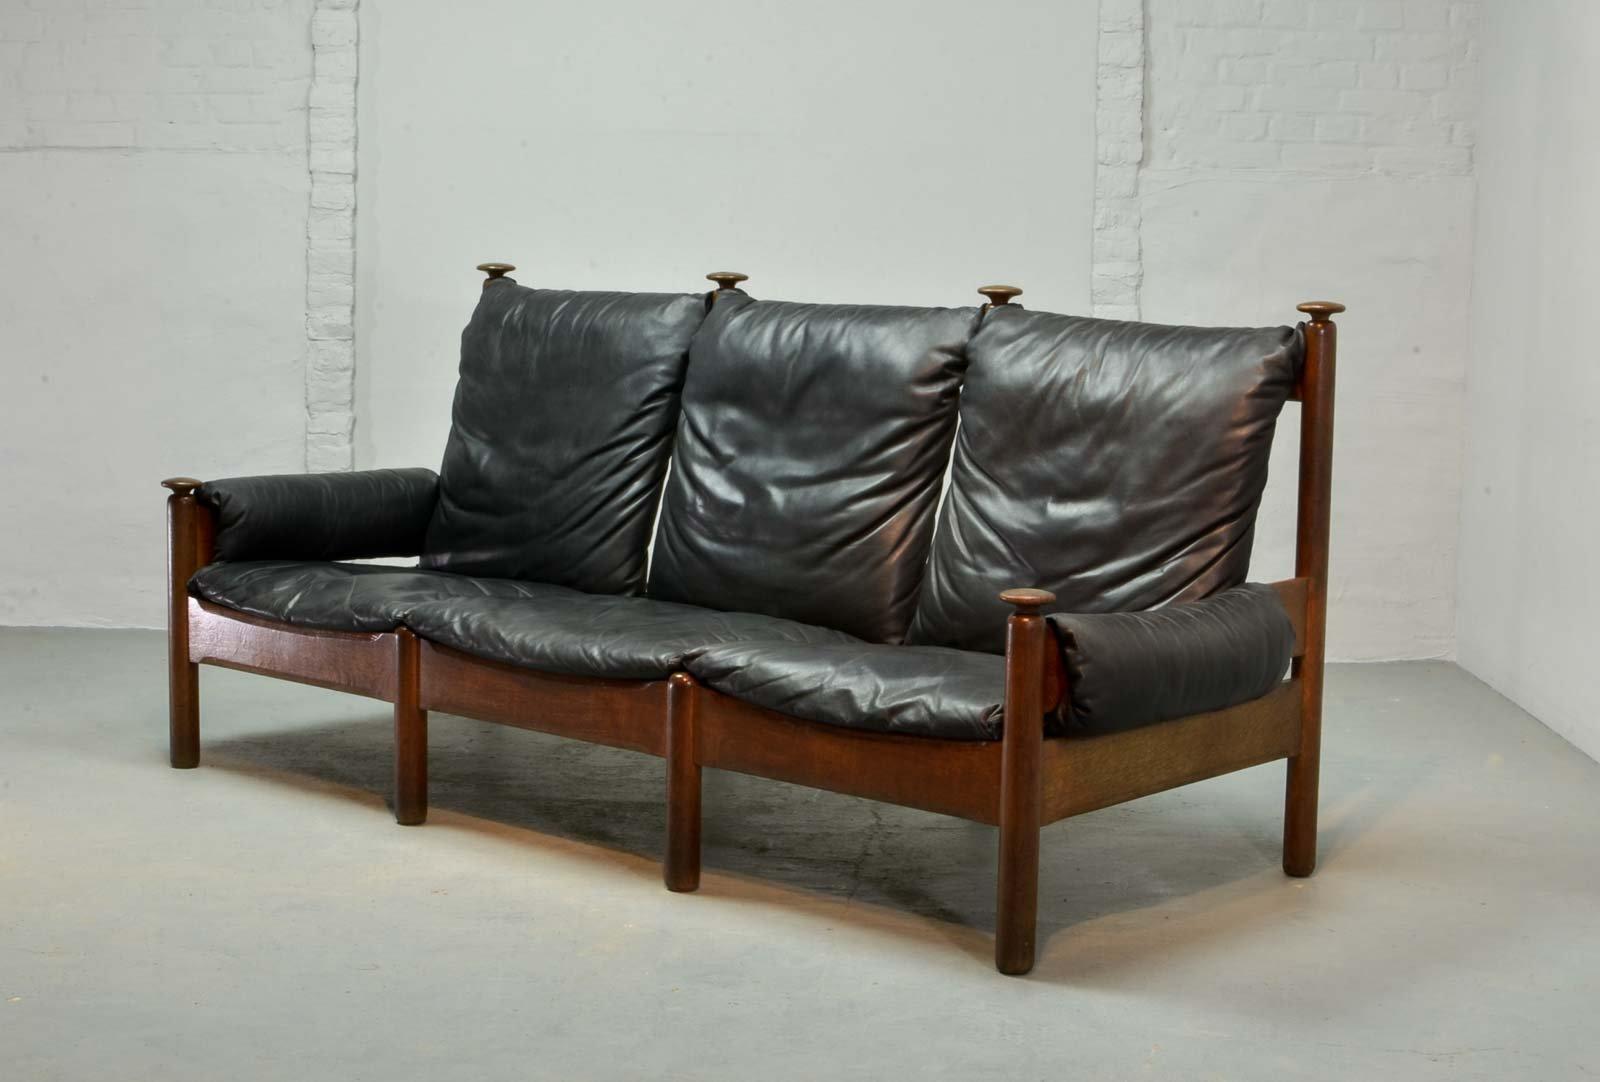 skandinavisches schwarzes drei sitzer ledersofa 1960er. Black Bedroom Furniture Sets. Home Design Ideas